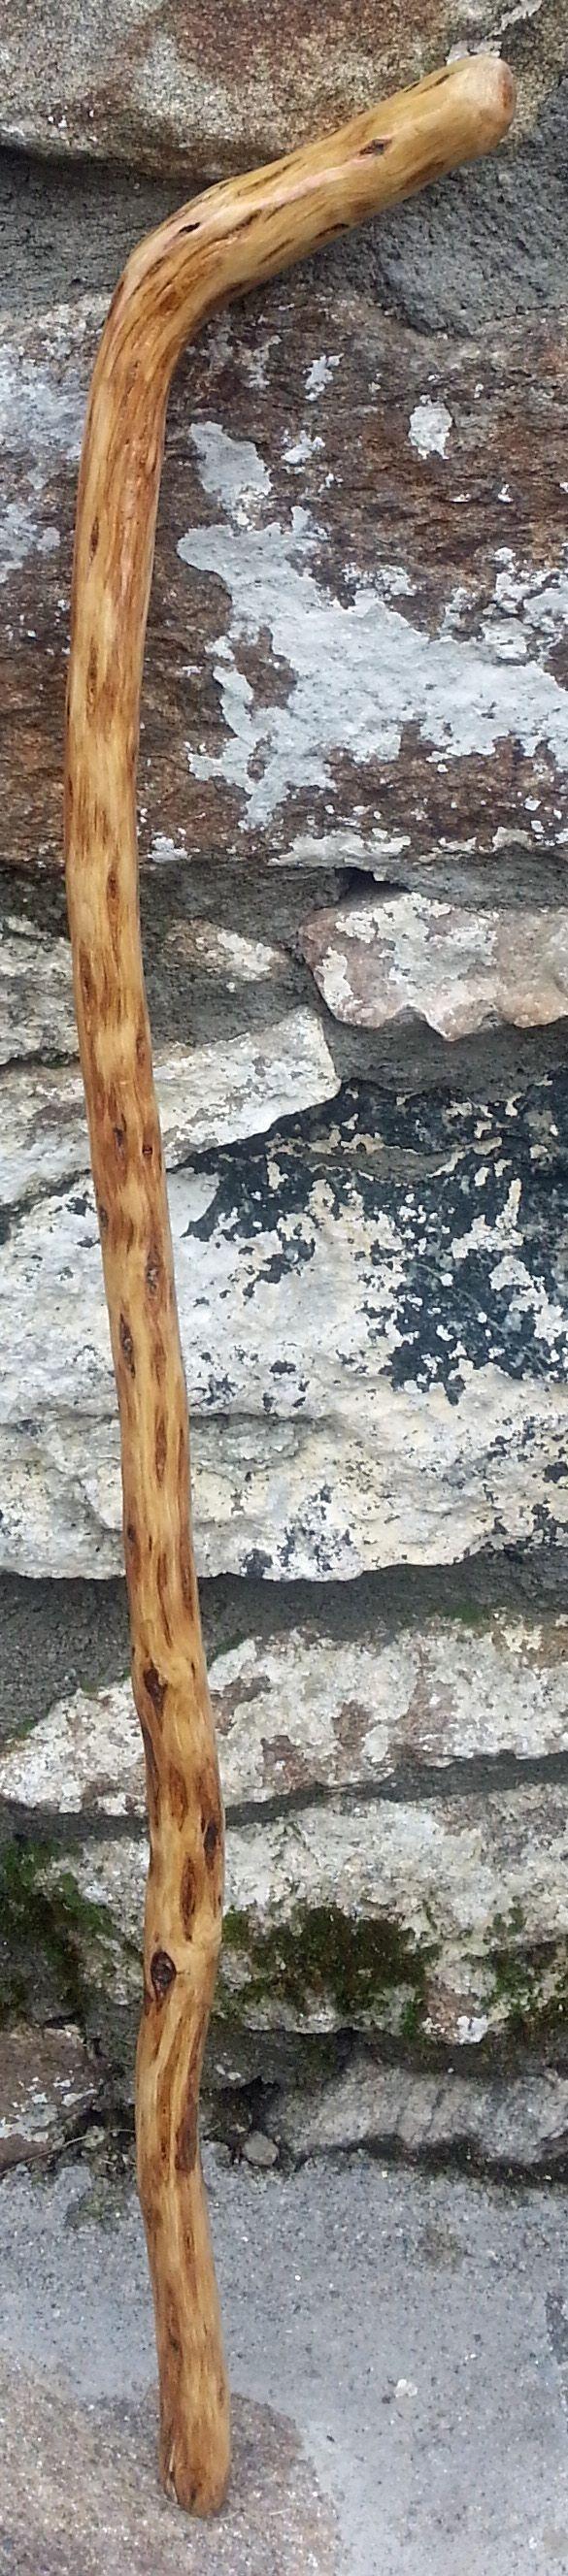 Authentic Irish Walking Stick - Gorse